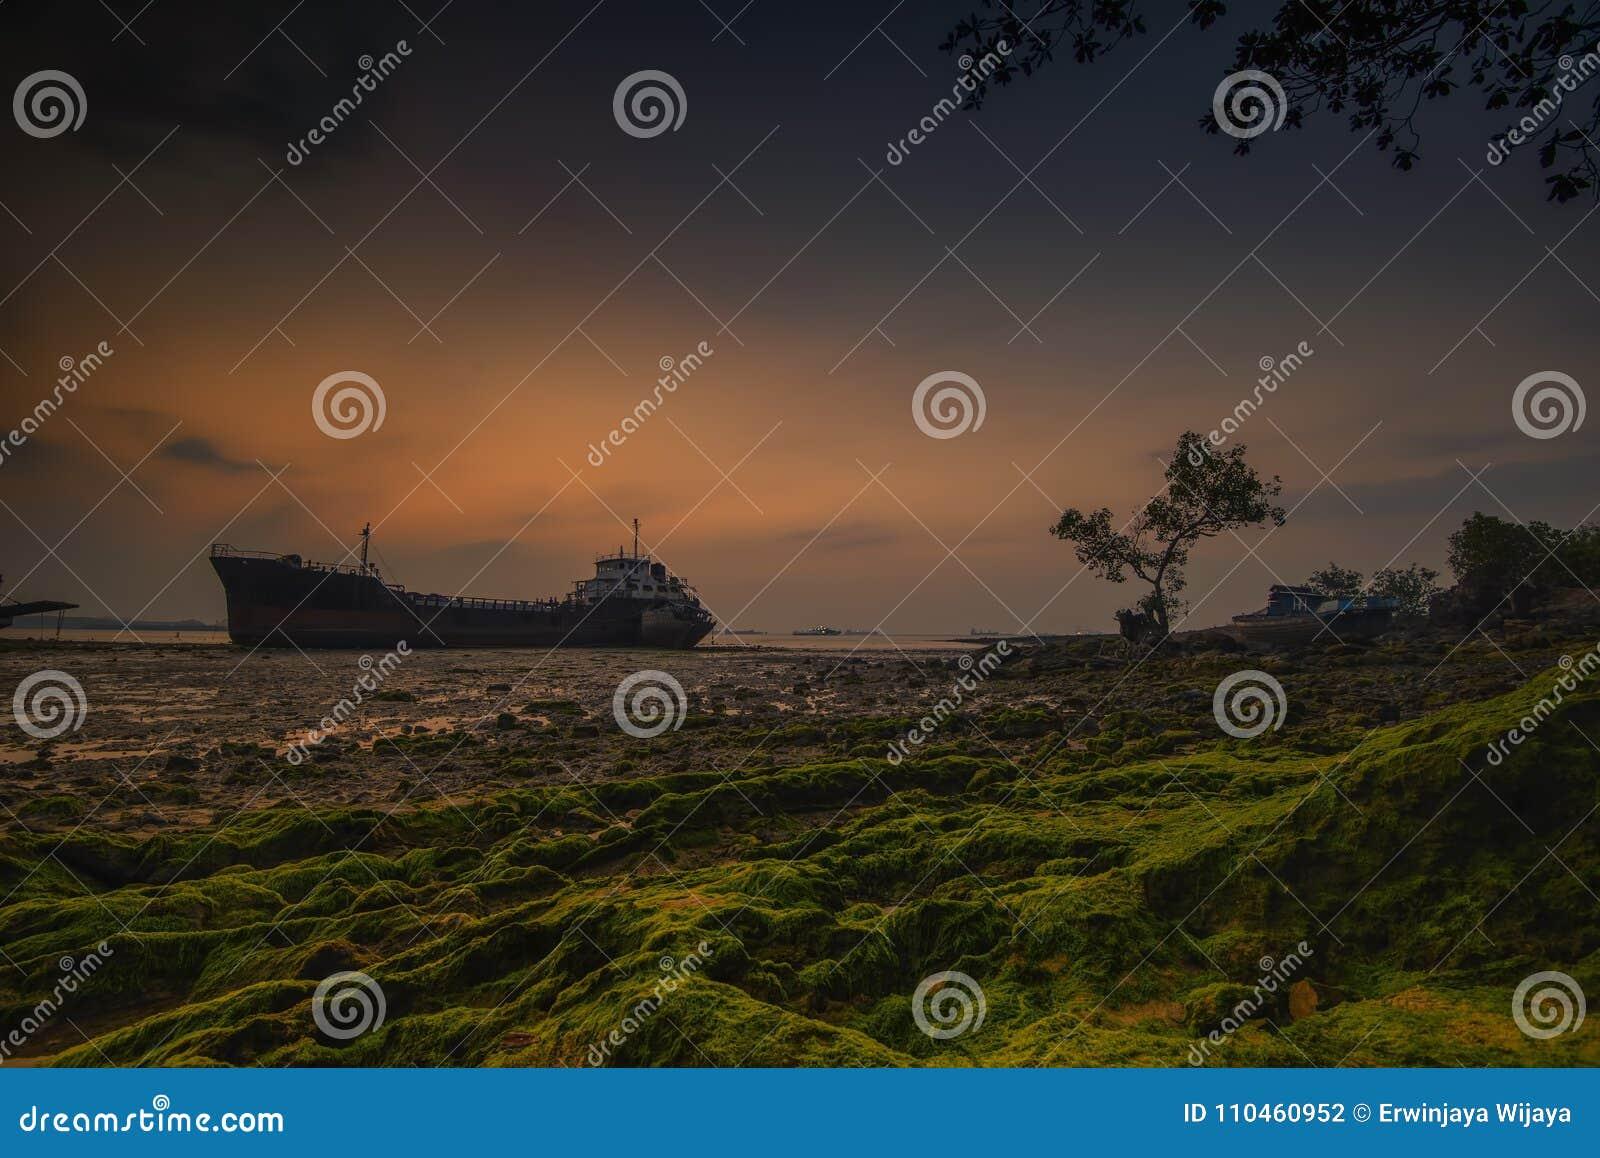 Wonderfull Sunset2 Batam ö Indonesien asia